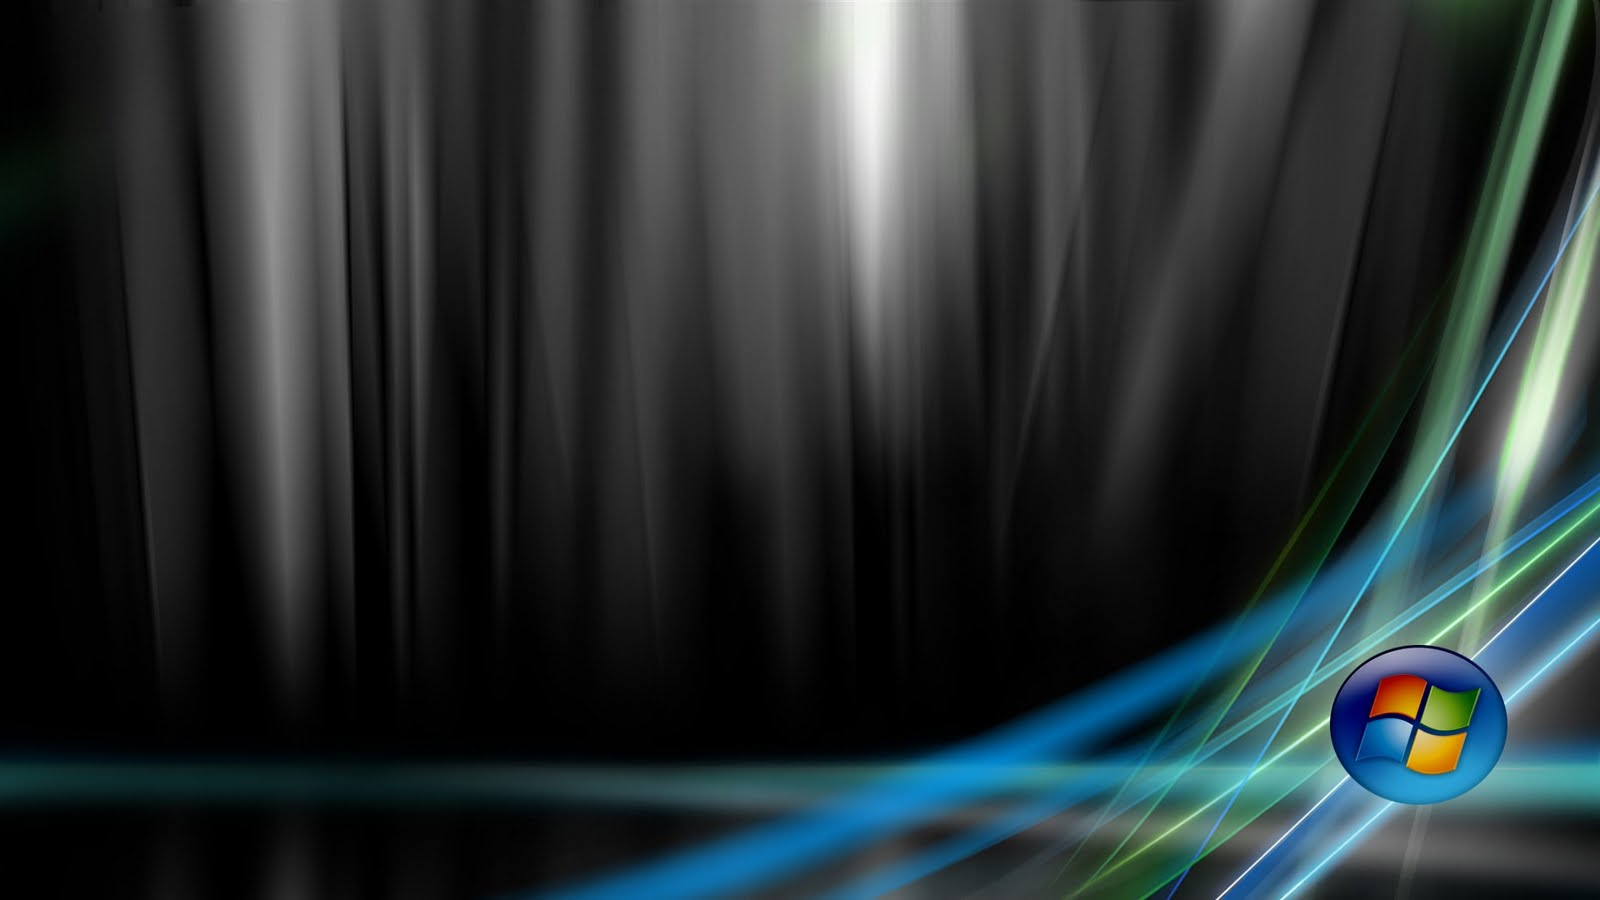 2011 <b>Wallpapers</b>: <b>Vista Wallpapers Hd 1080p</b> Download